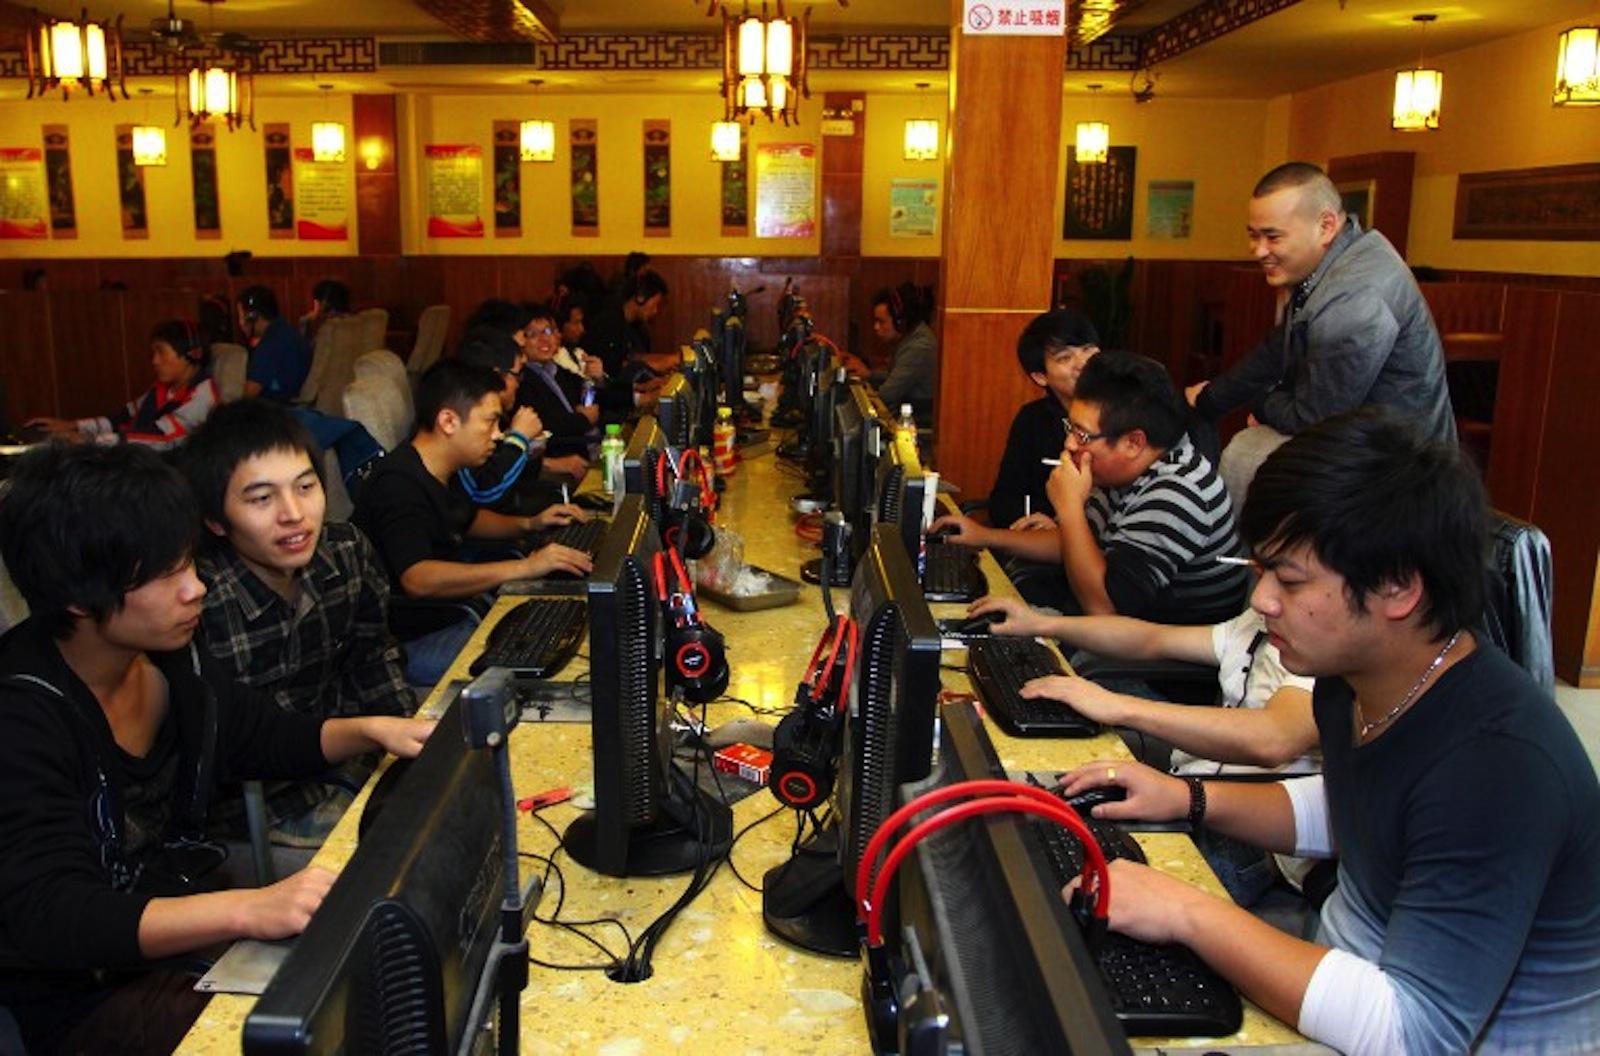 china-internet-cafe-nov-2012.jpg